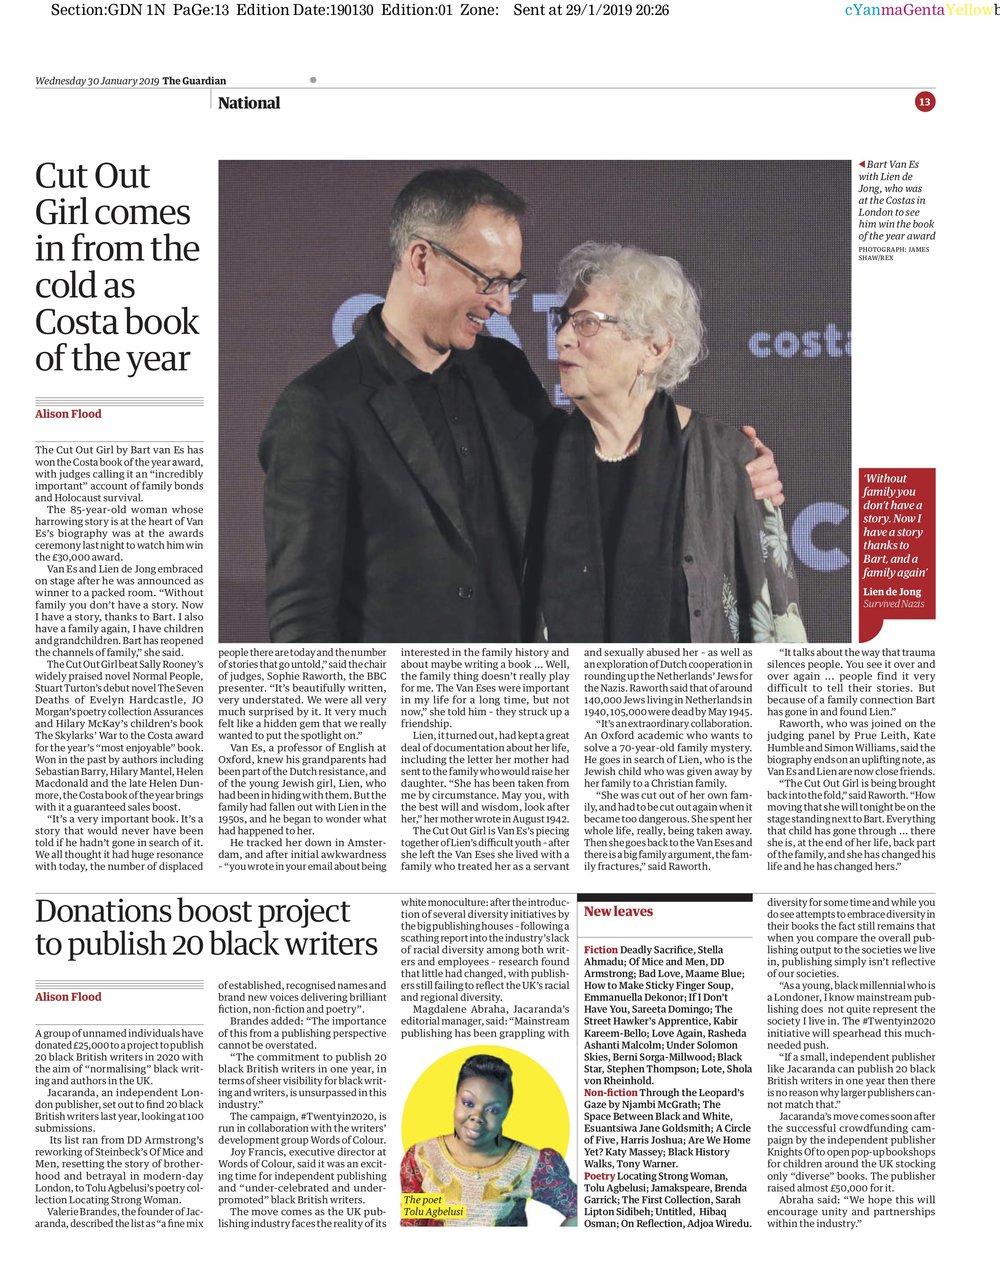 costa_guardian.jpg